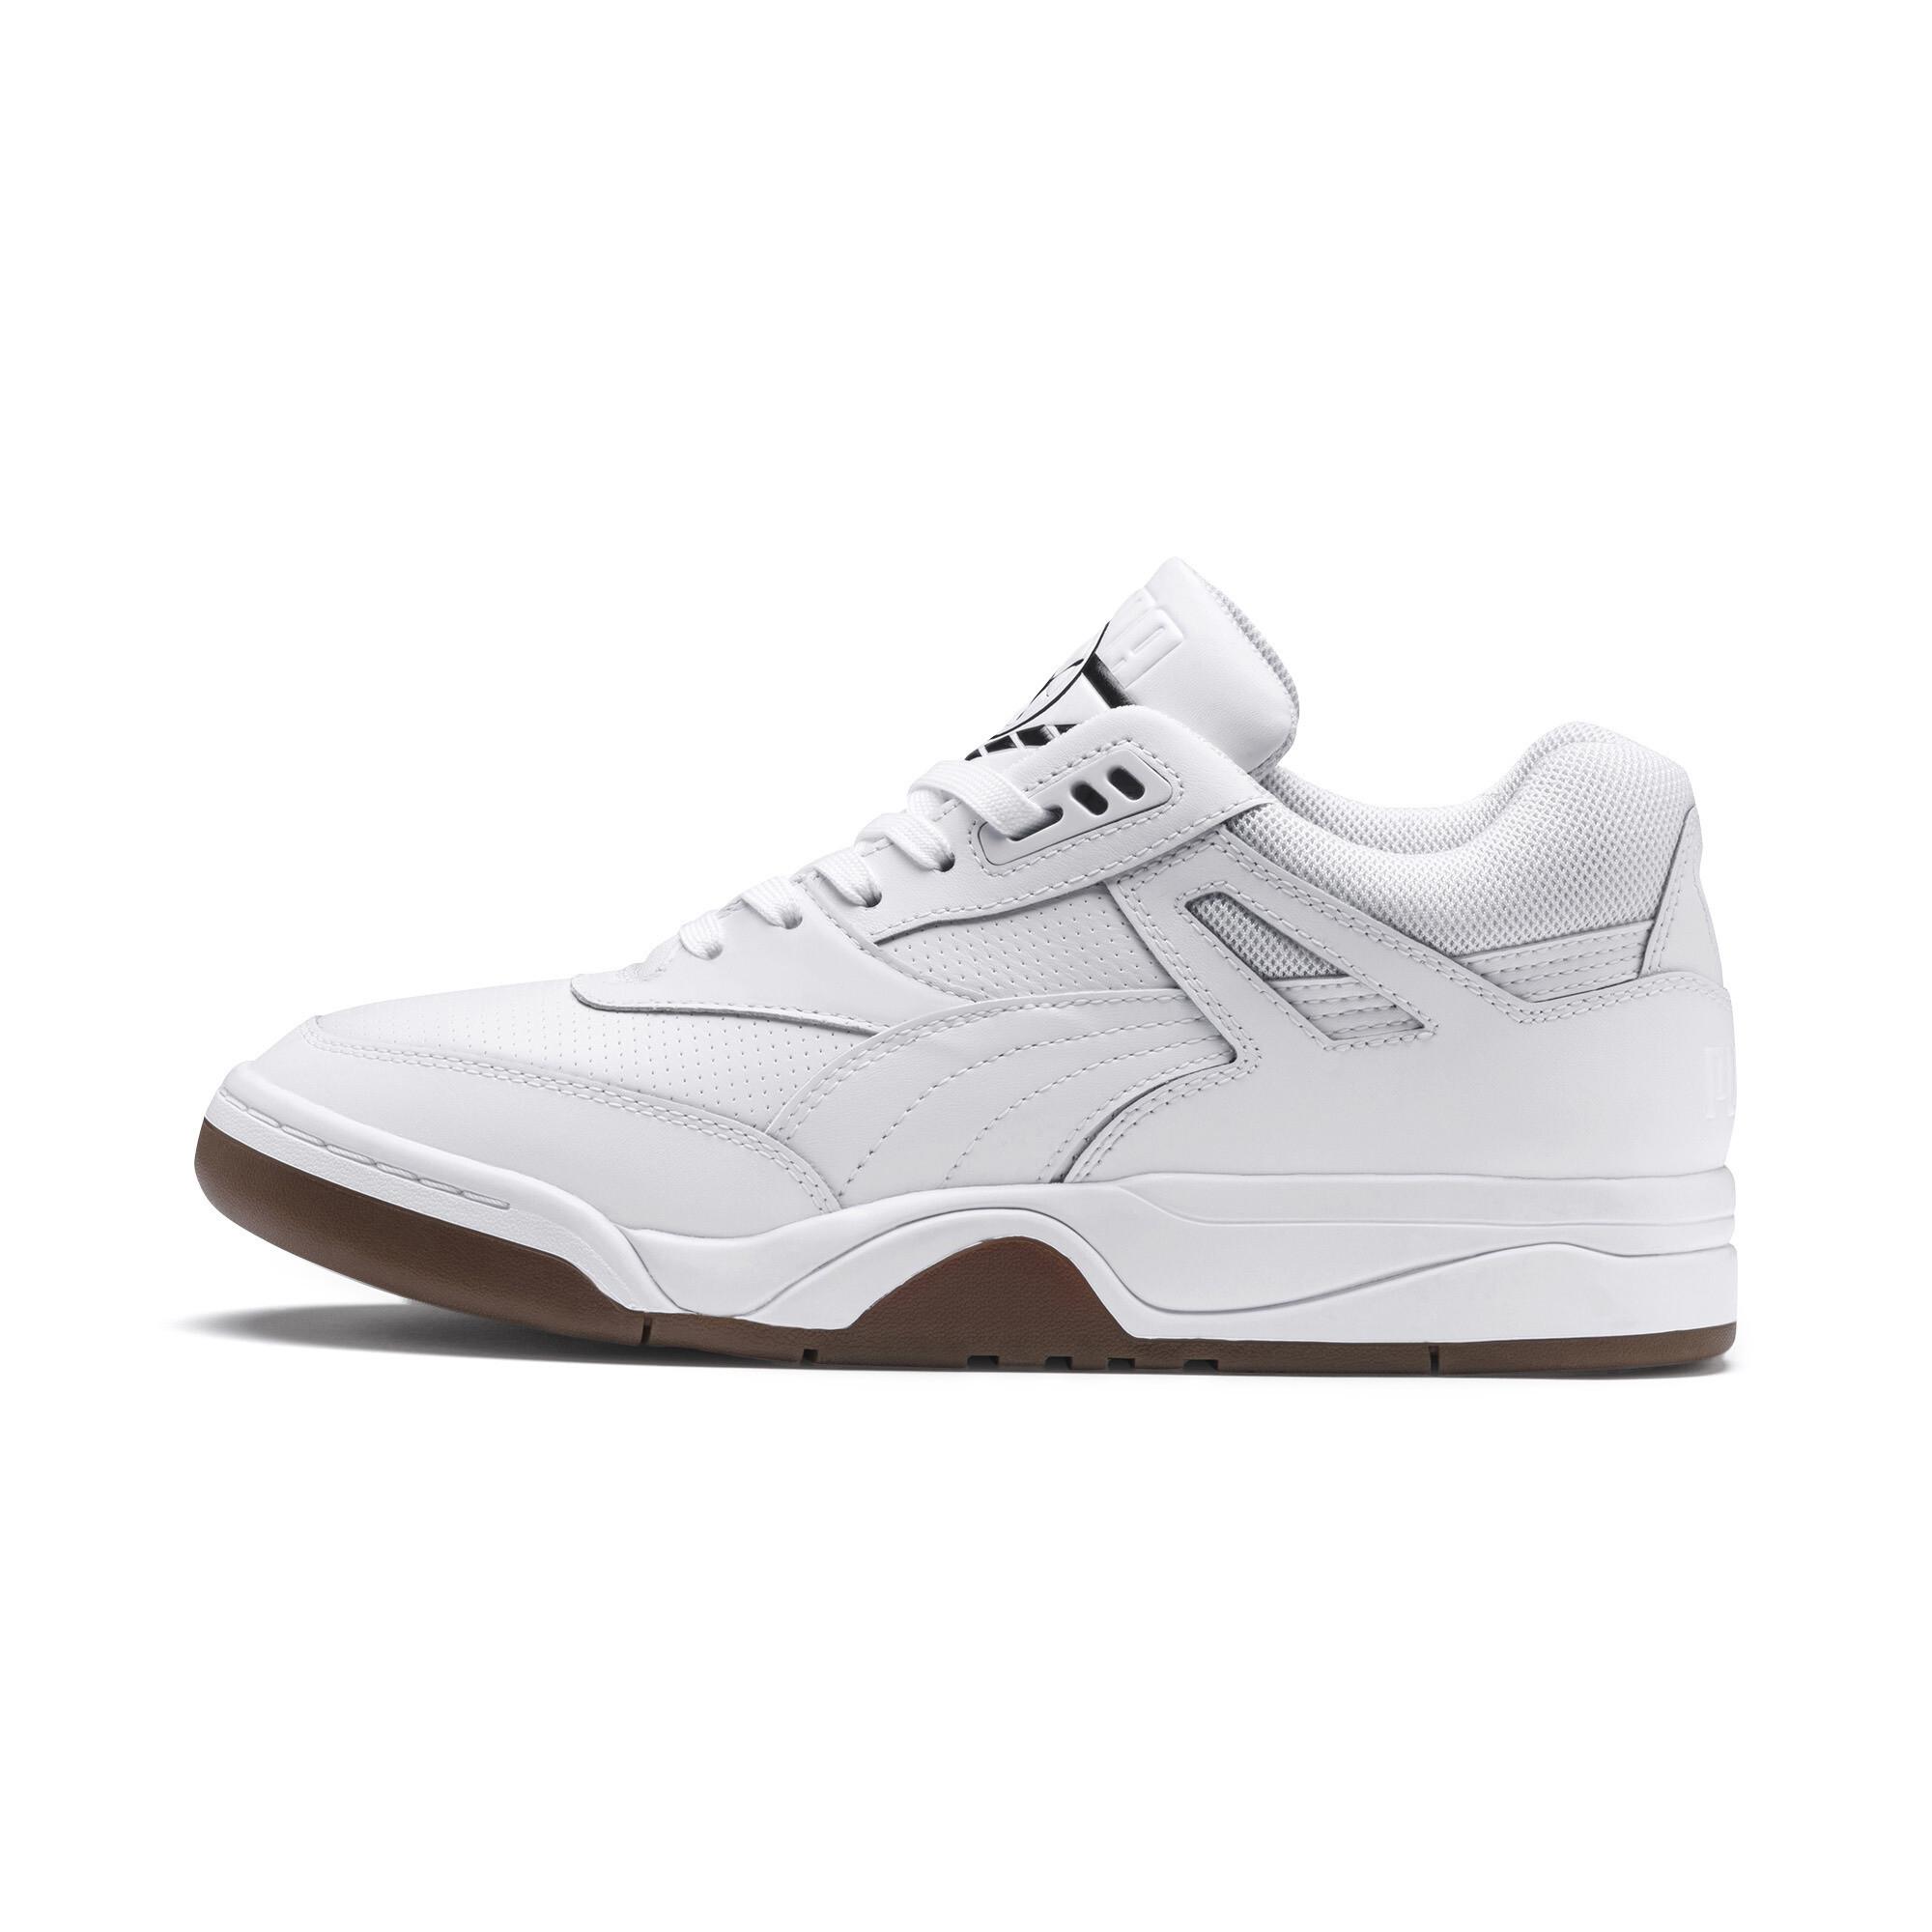 Indexbild 19 - PUMA Palace Guard Sneaker Unisex Schuhe Sport Classics Neu